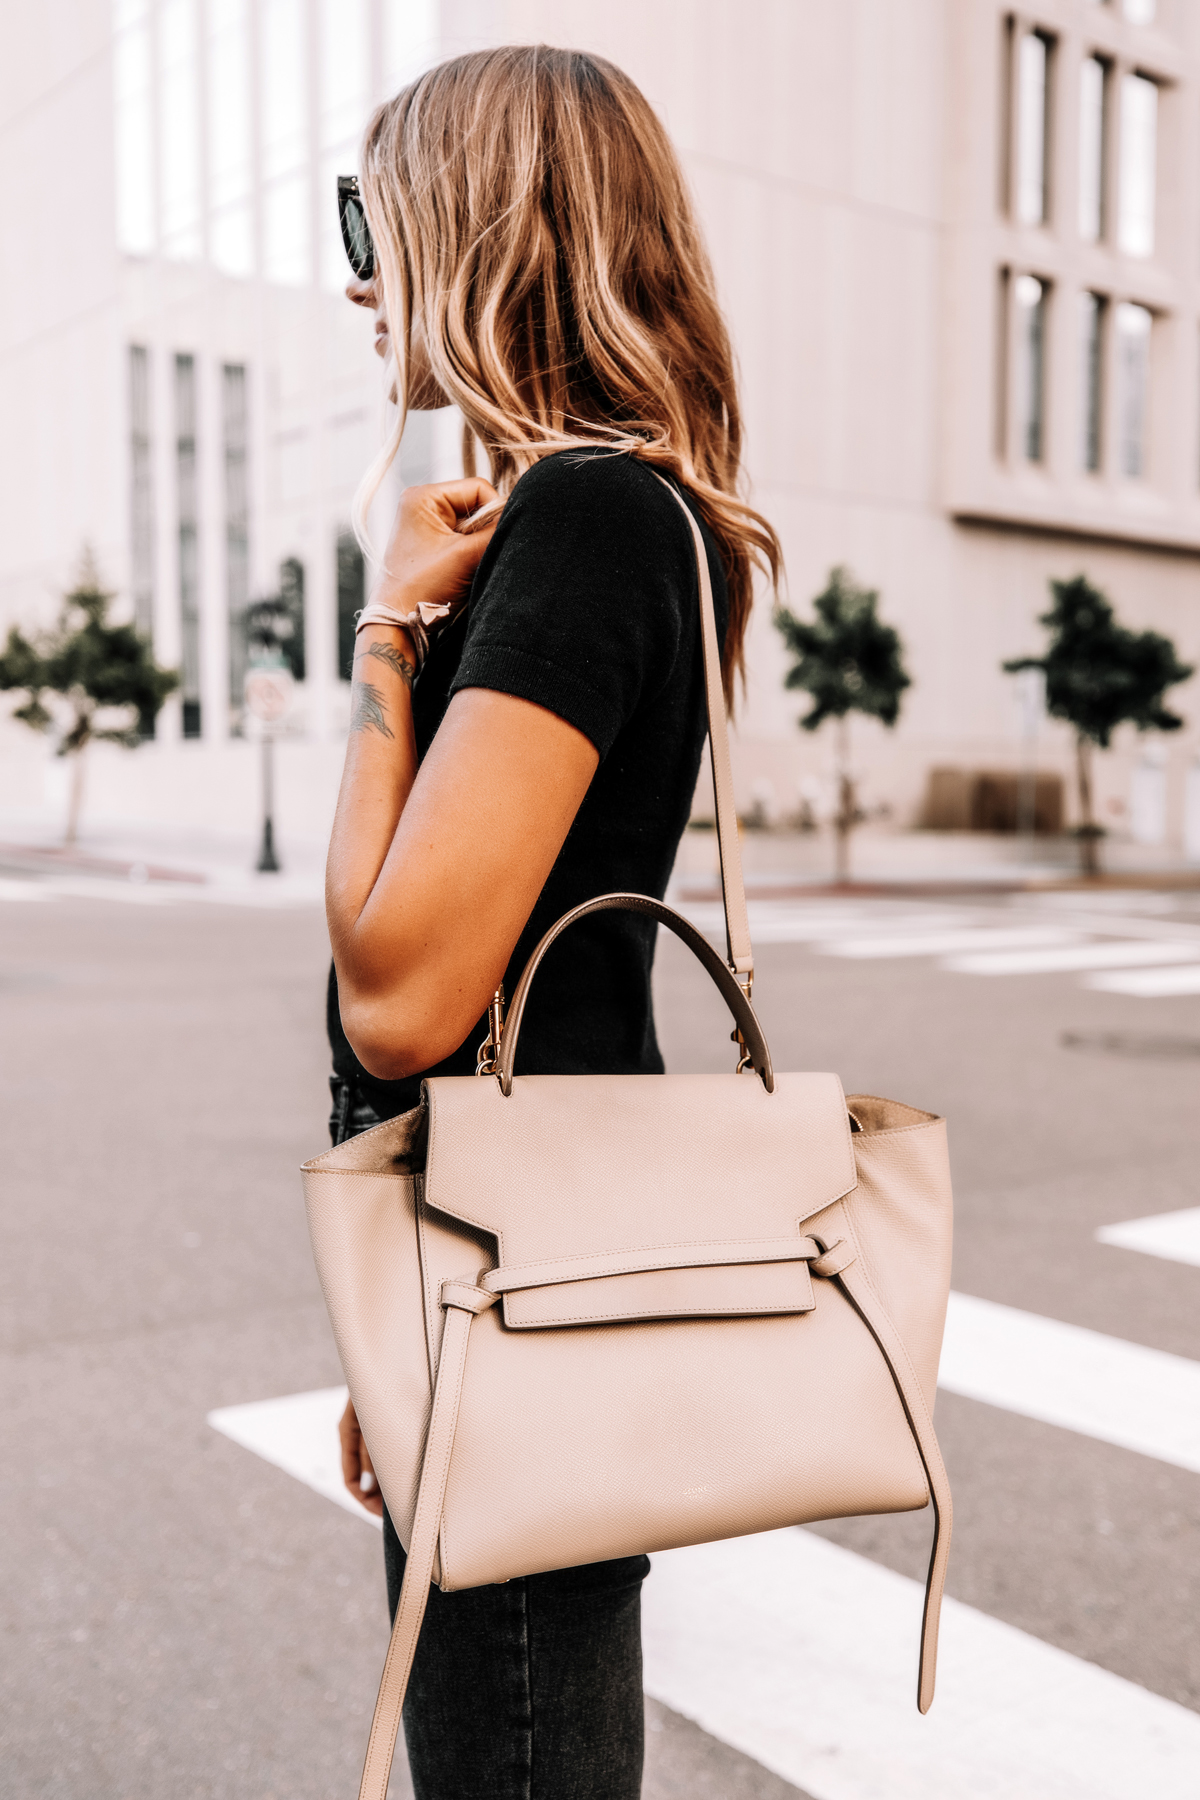 Fashion Jackson Celine Mini Belt Bag Review 2